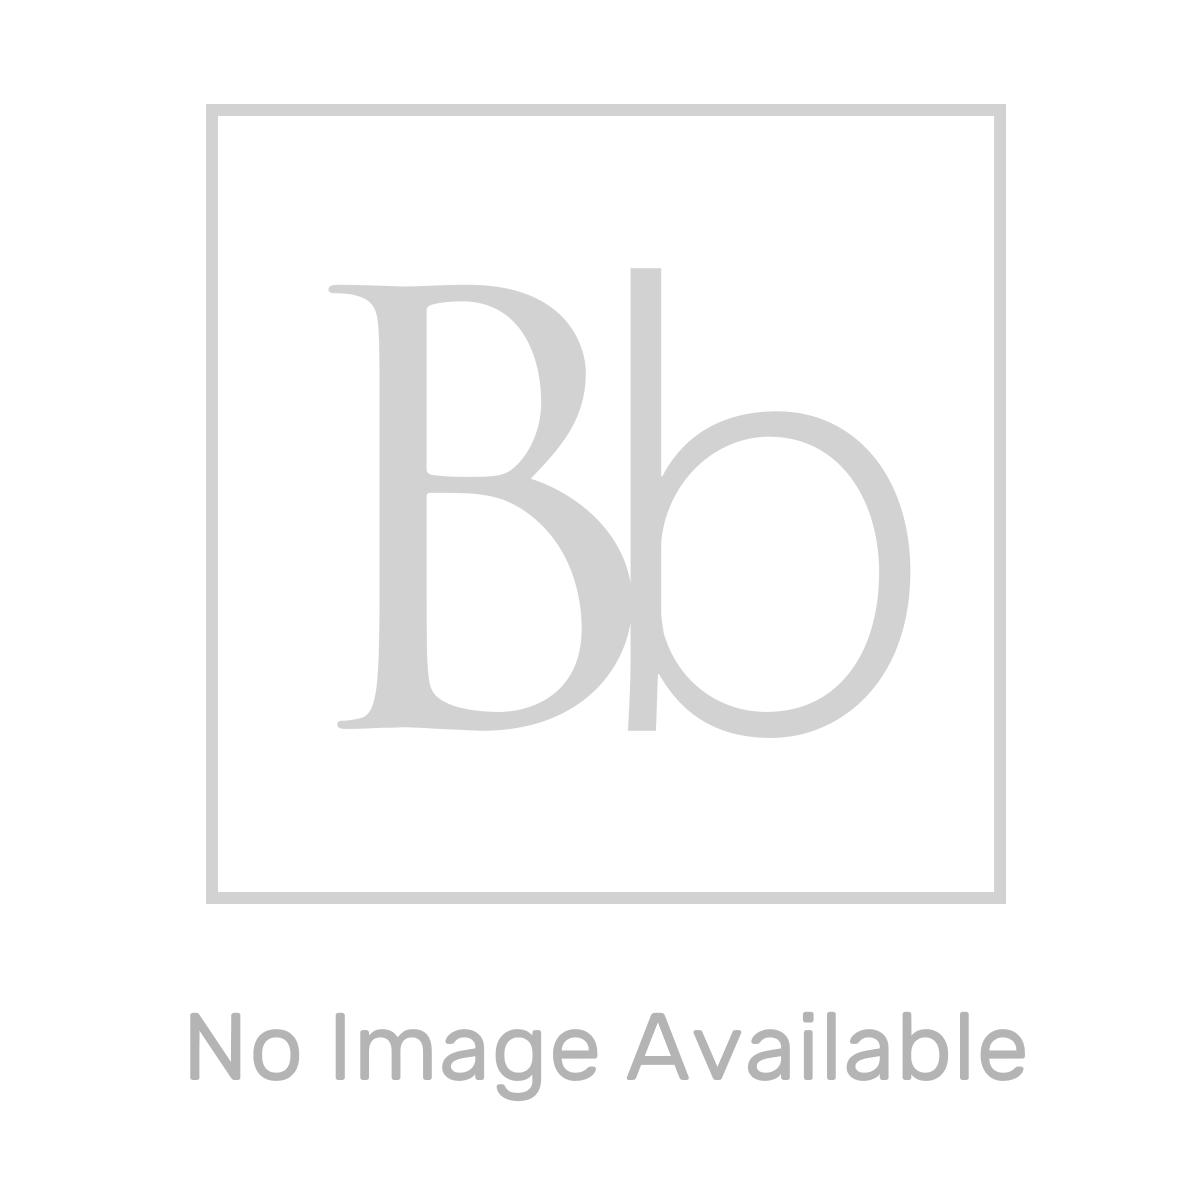 Nuie Athena Gloss Grey 2 Door Floor Standing Vanity Unit with 40mm Profile Basin 500mm Line Drawing